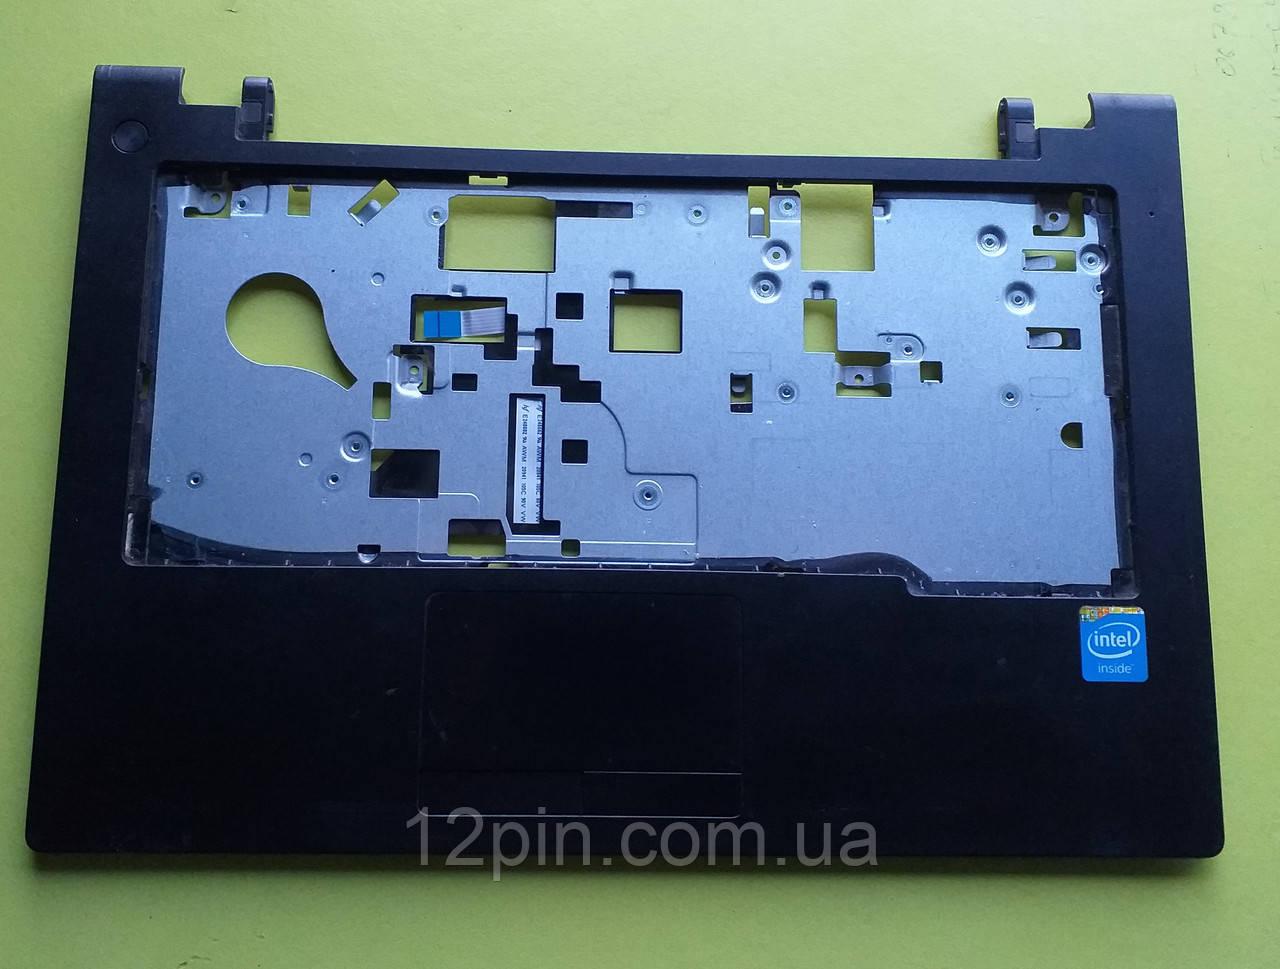 Топкейс  Lenovo IdeaPad S20-30 б.у. оригинал